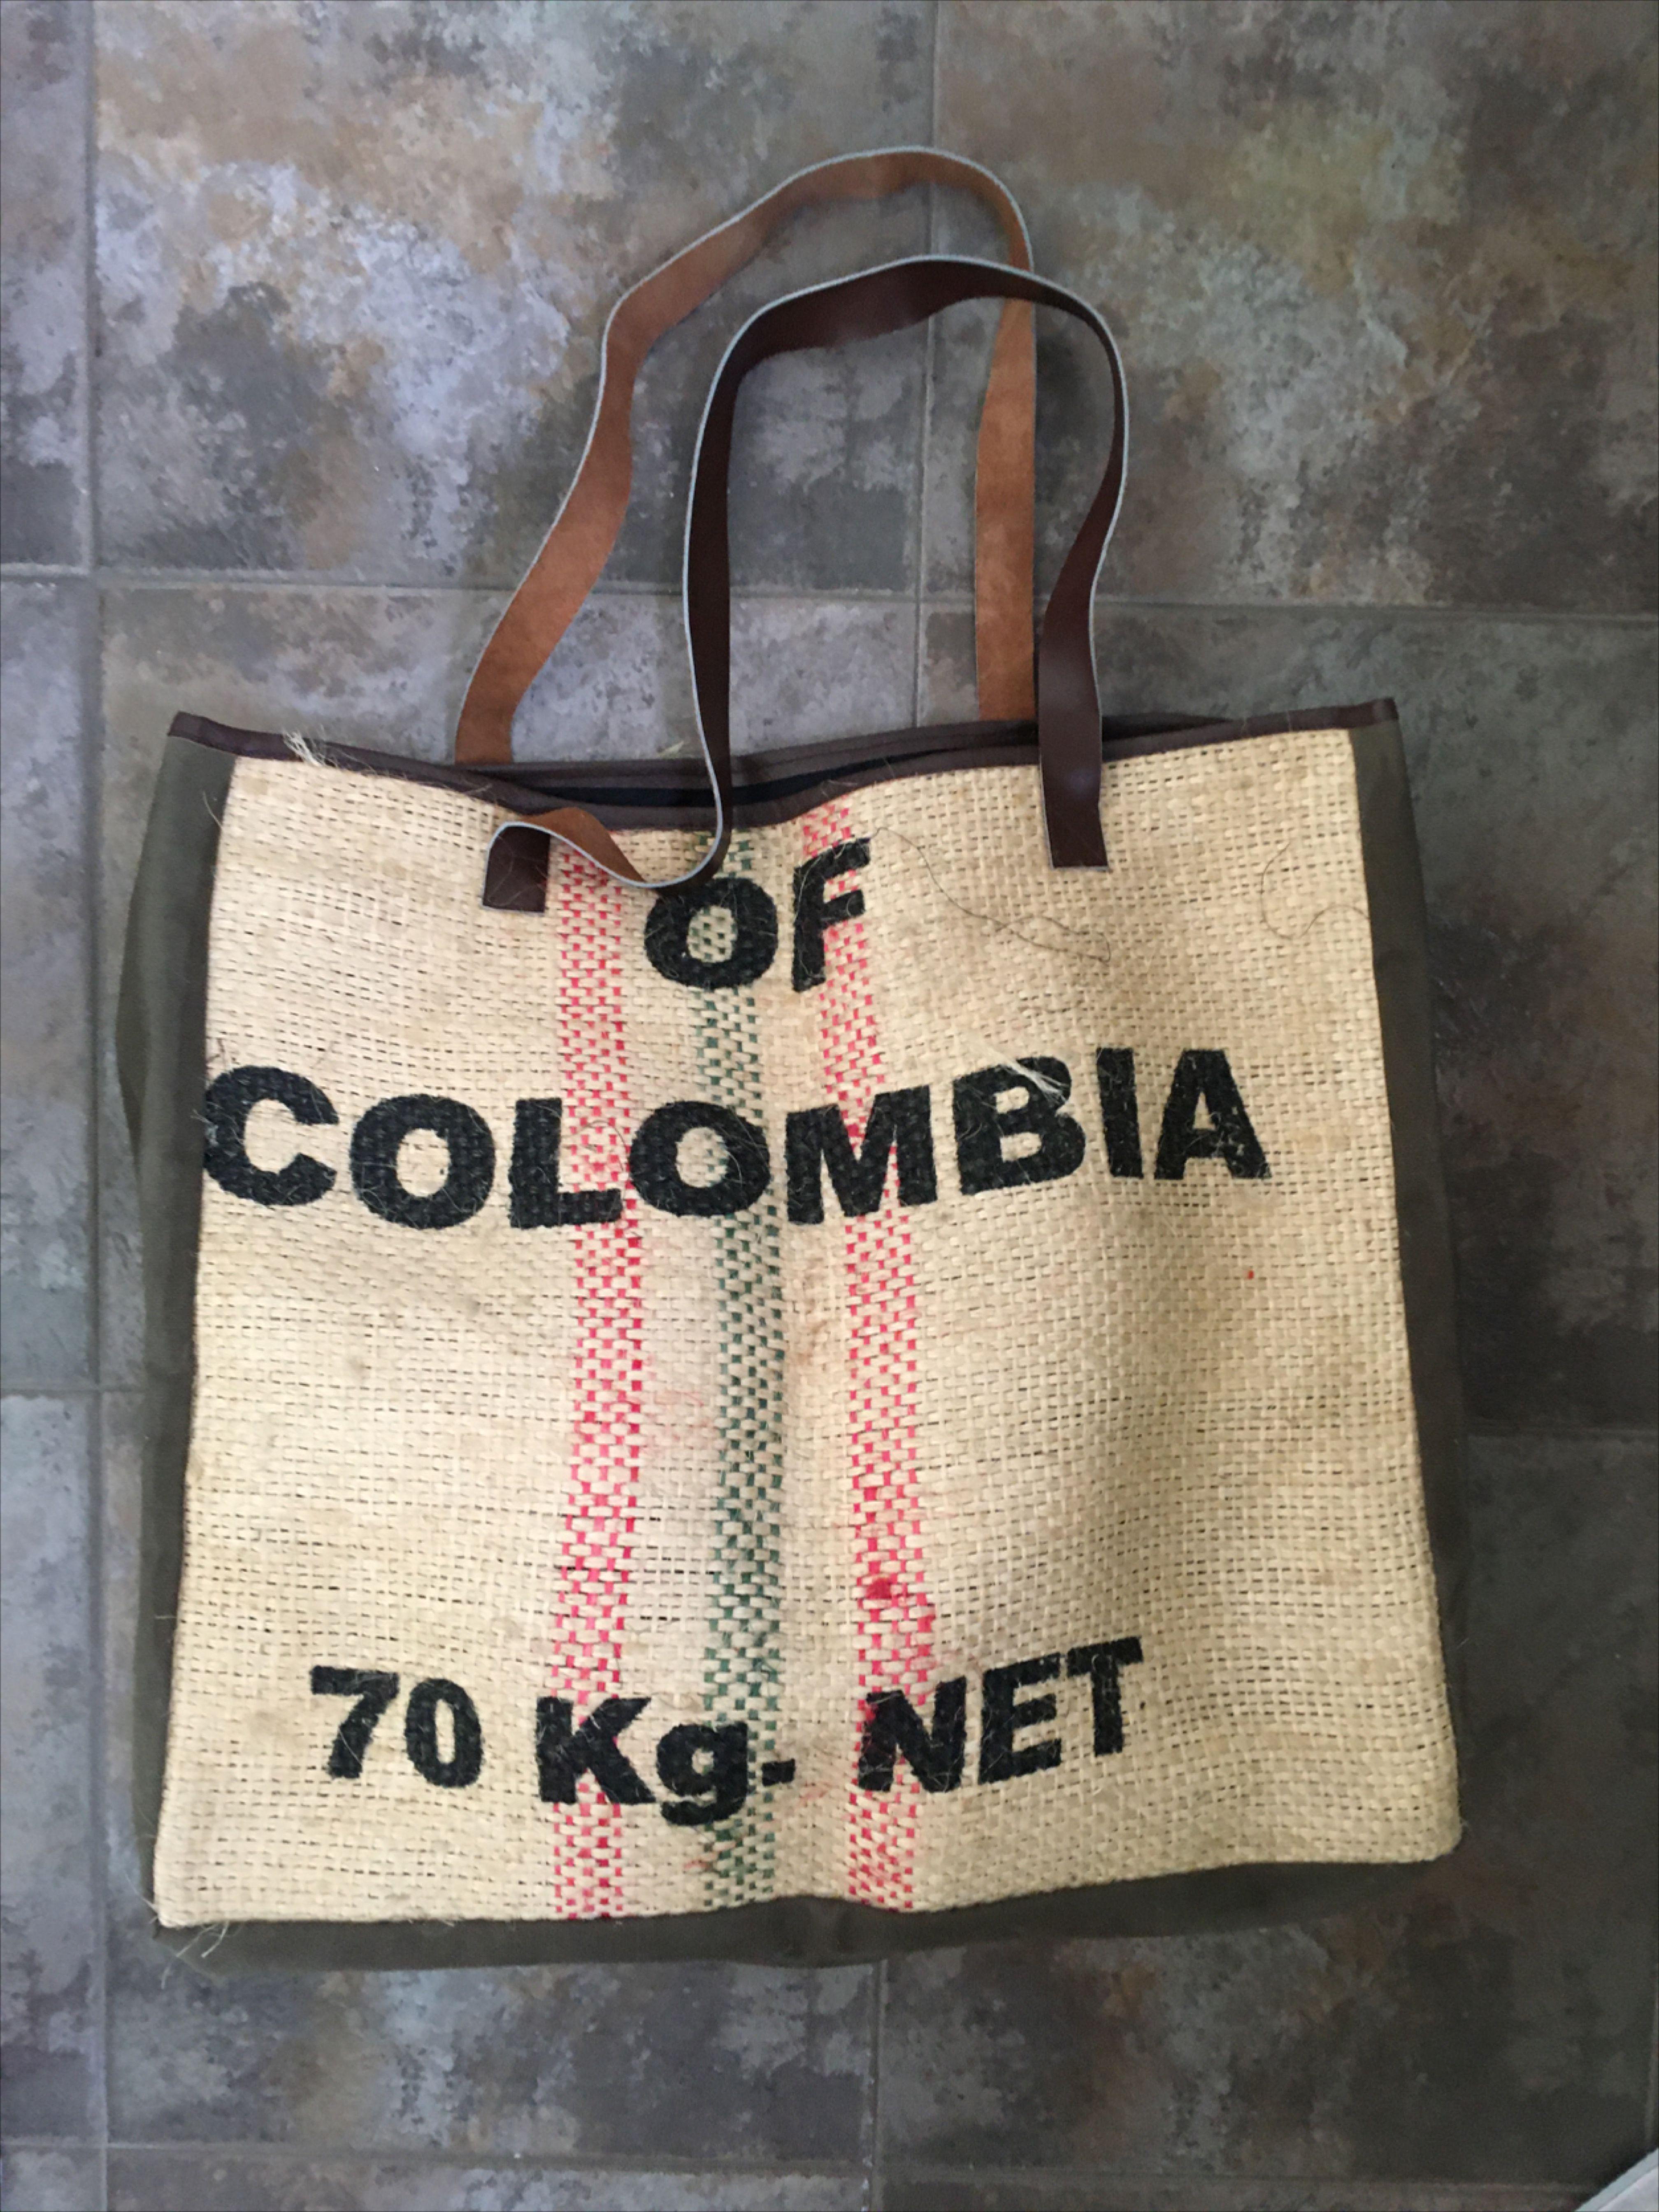 Tote Bag Artisanal Handicraft Burrrp 11 For Coffee Lovers Burlap In 2020 Coffee Lover Tote Bag Green Coffee Bean